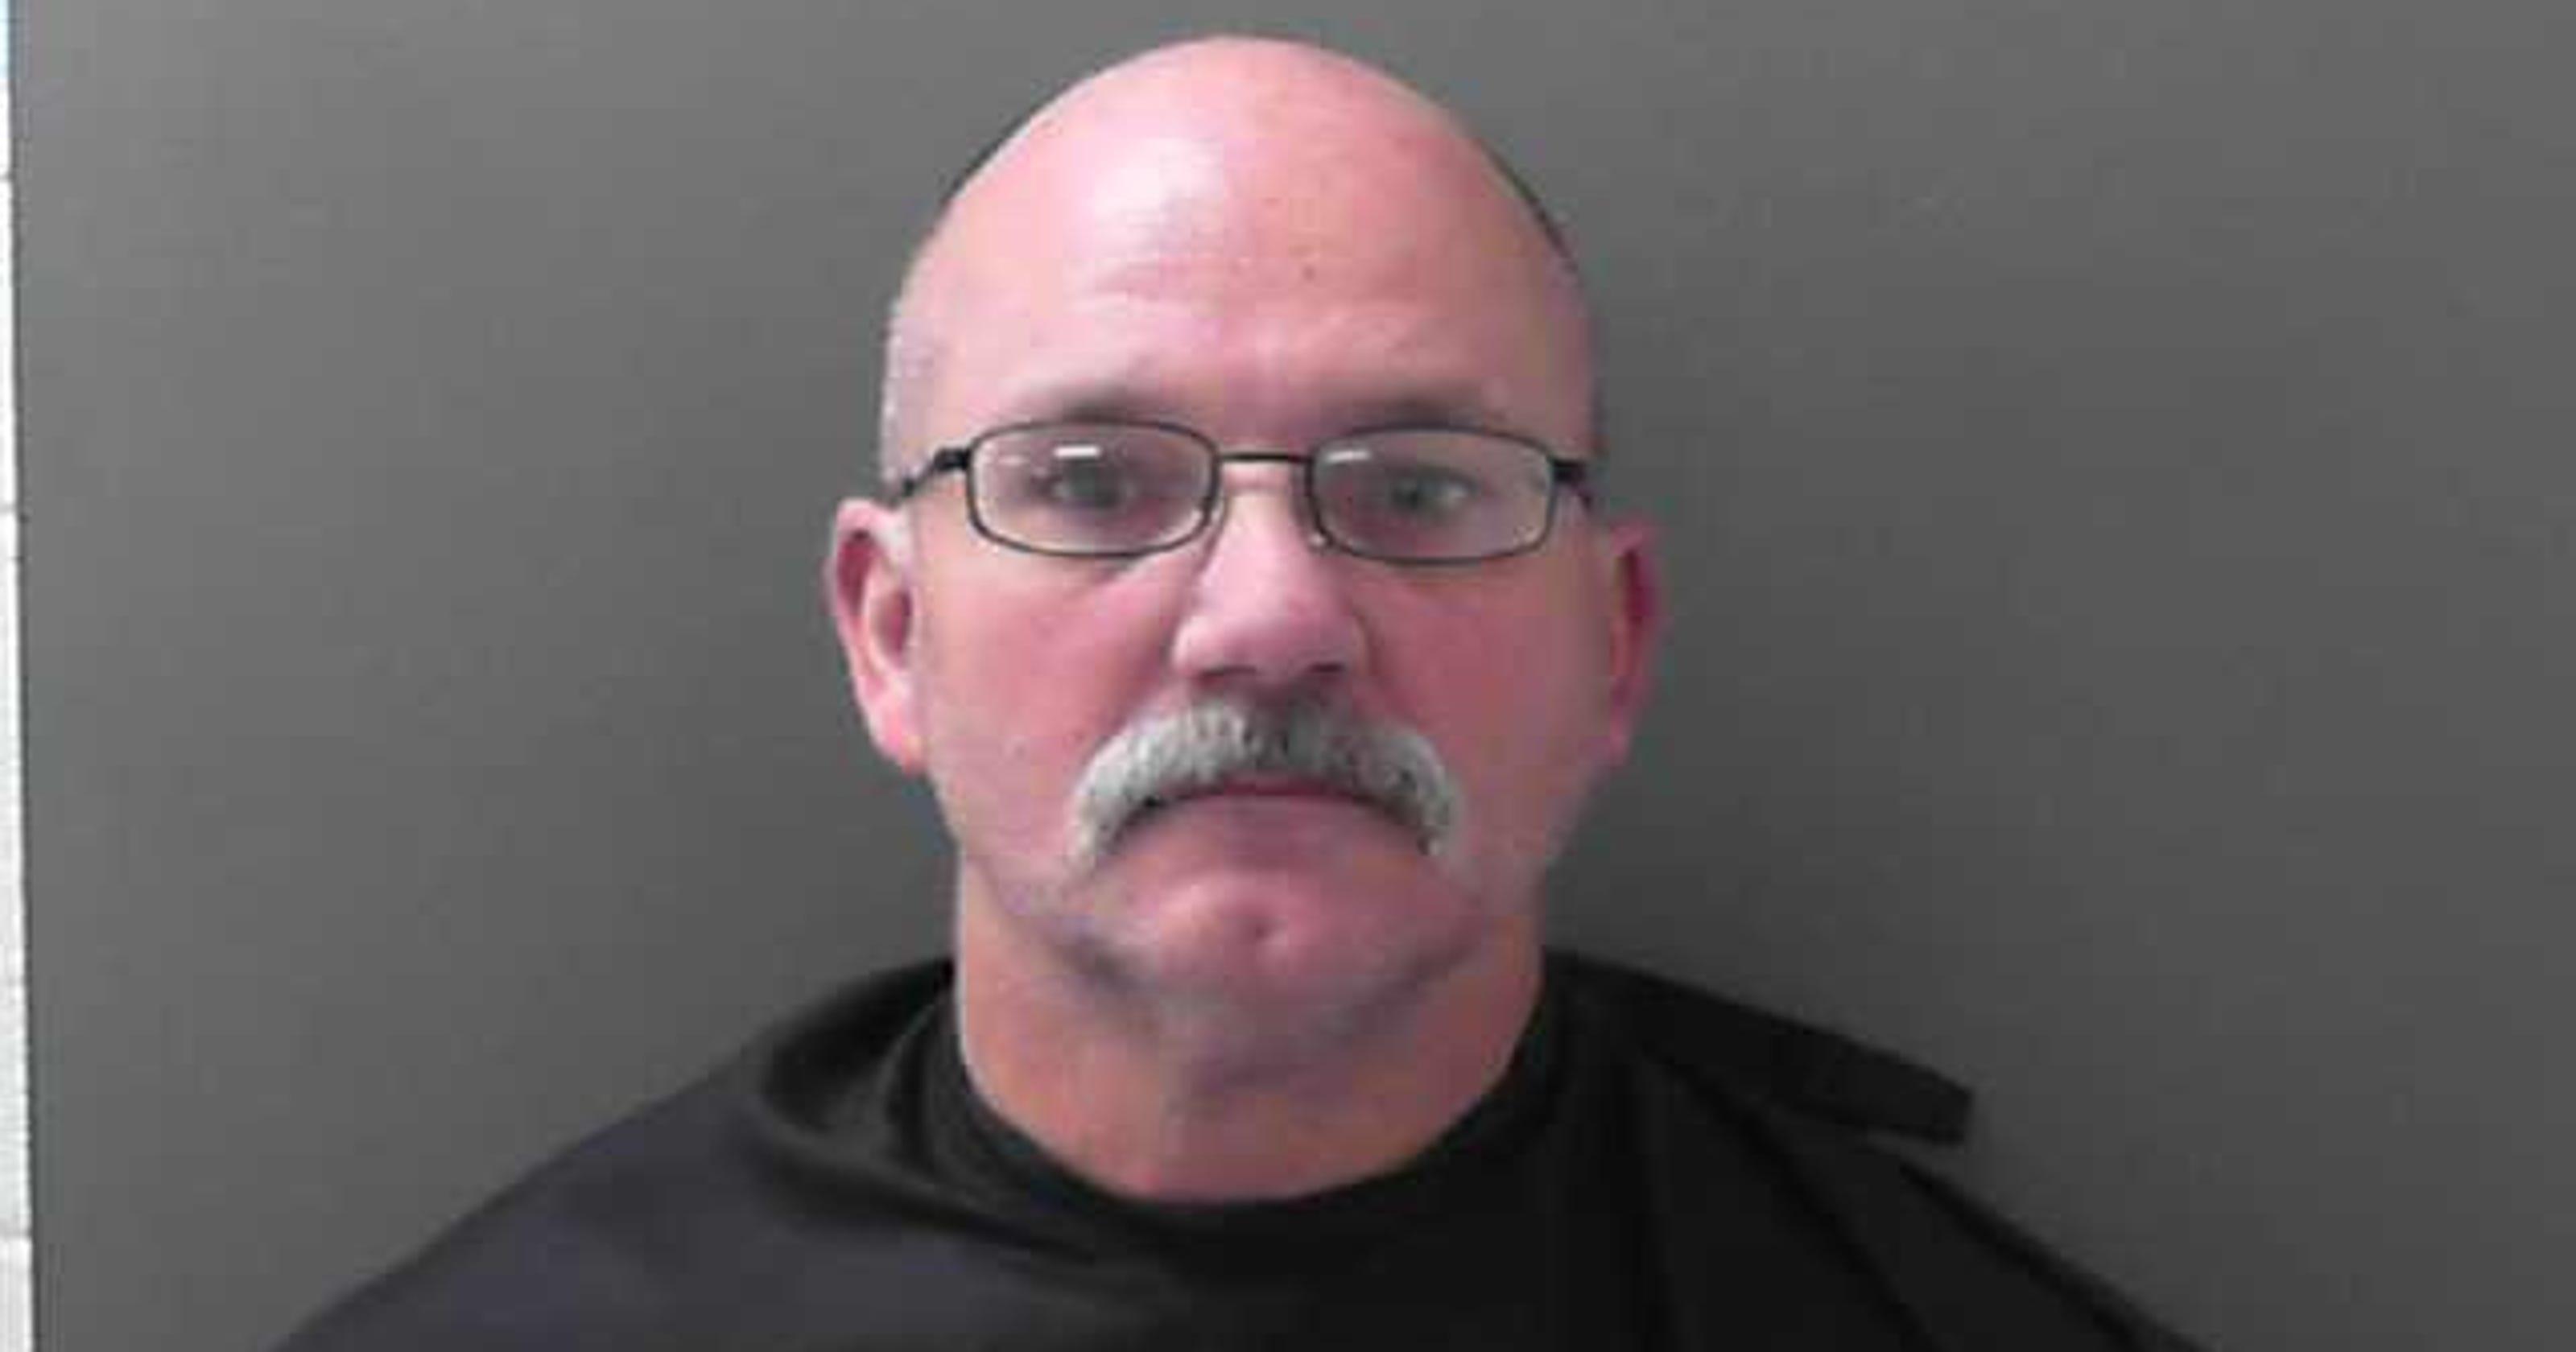 Pickens County deputy arrested, fired